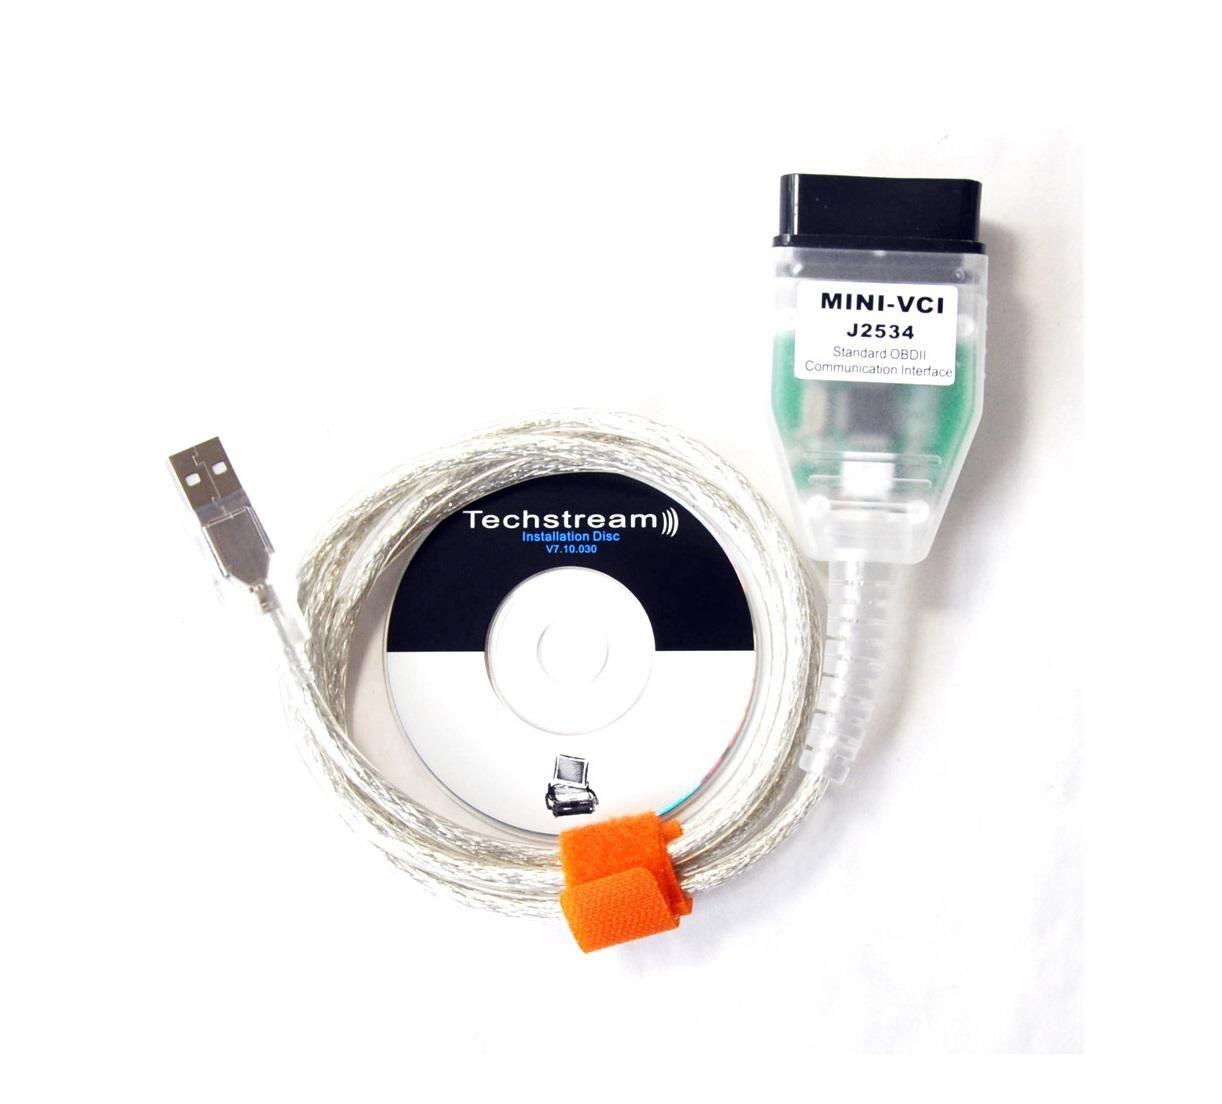 Original MINI VCI TOYOTA TIS Techstream Diagnostic Software